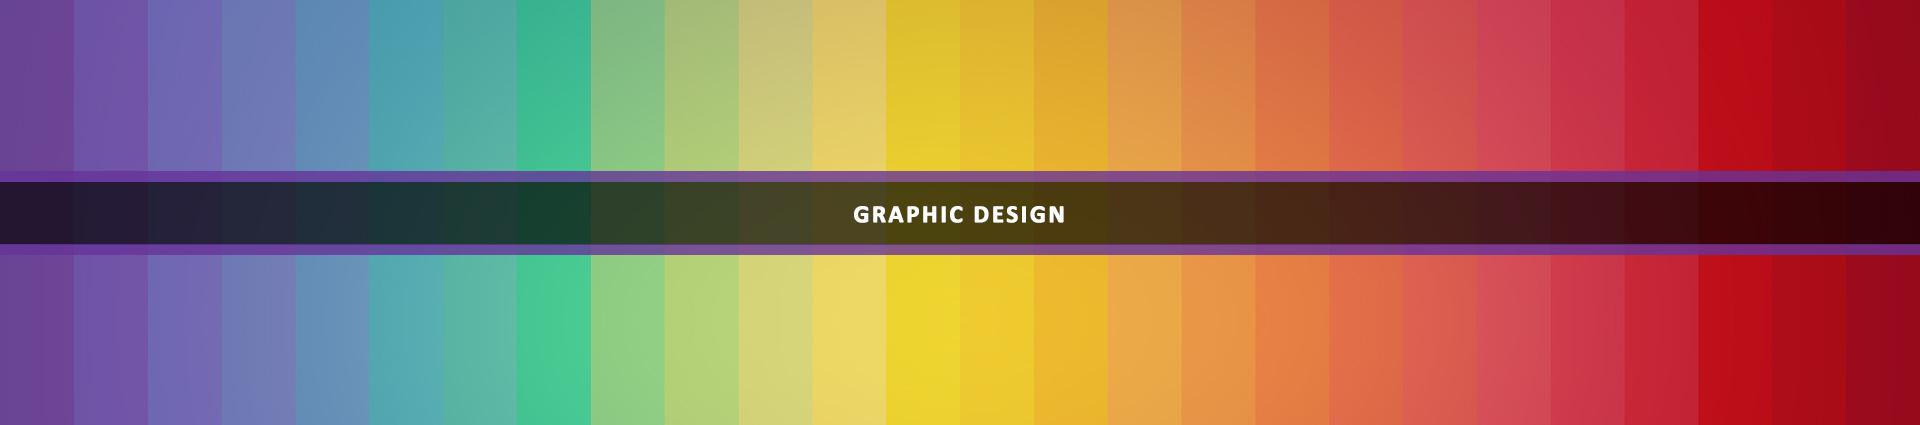 YPod Media Graphic Design Glasgow Scotland